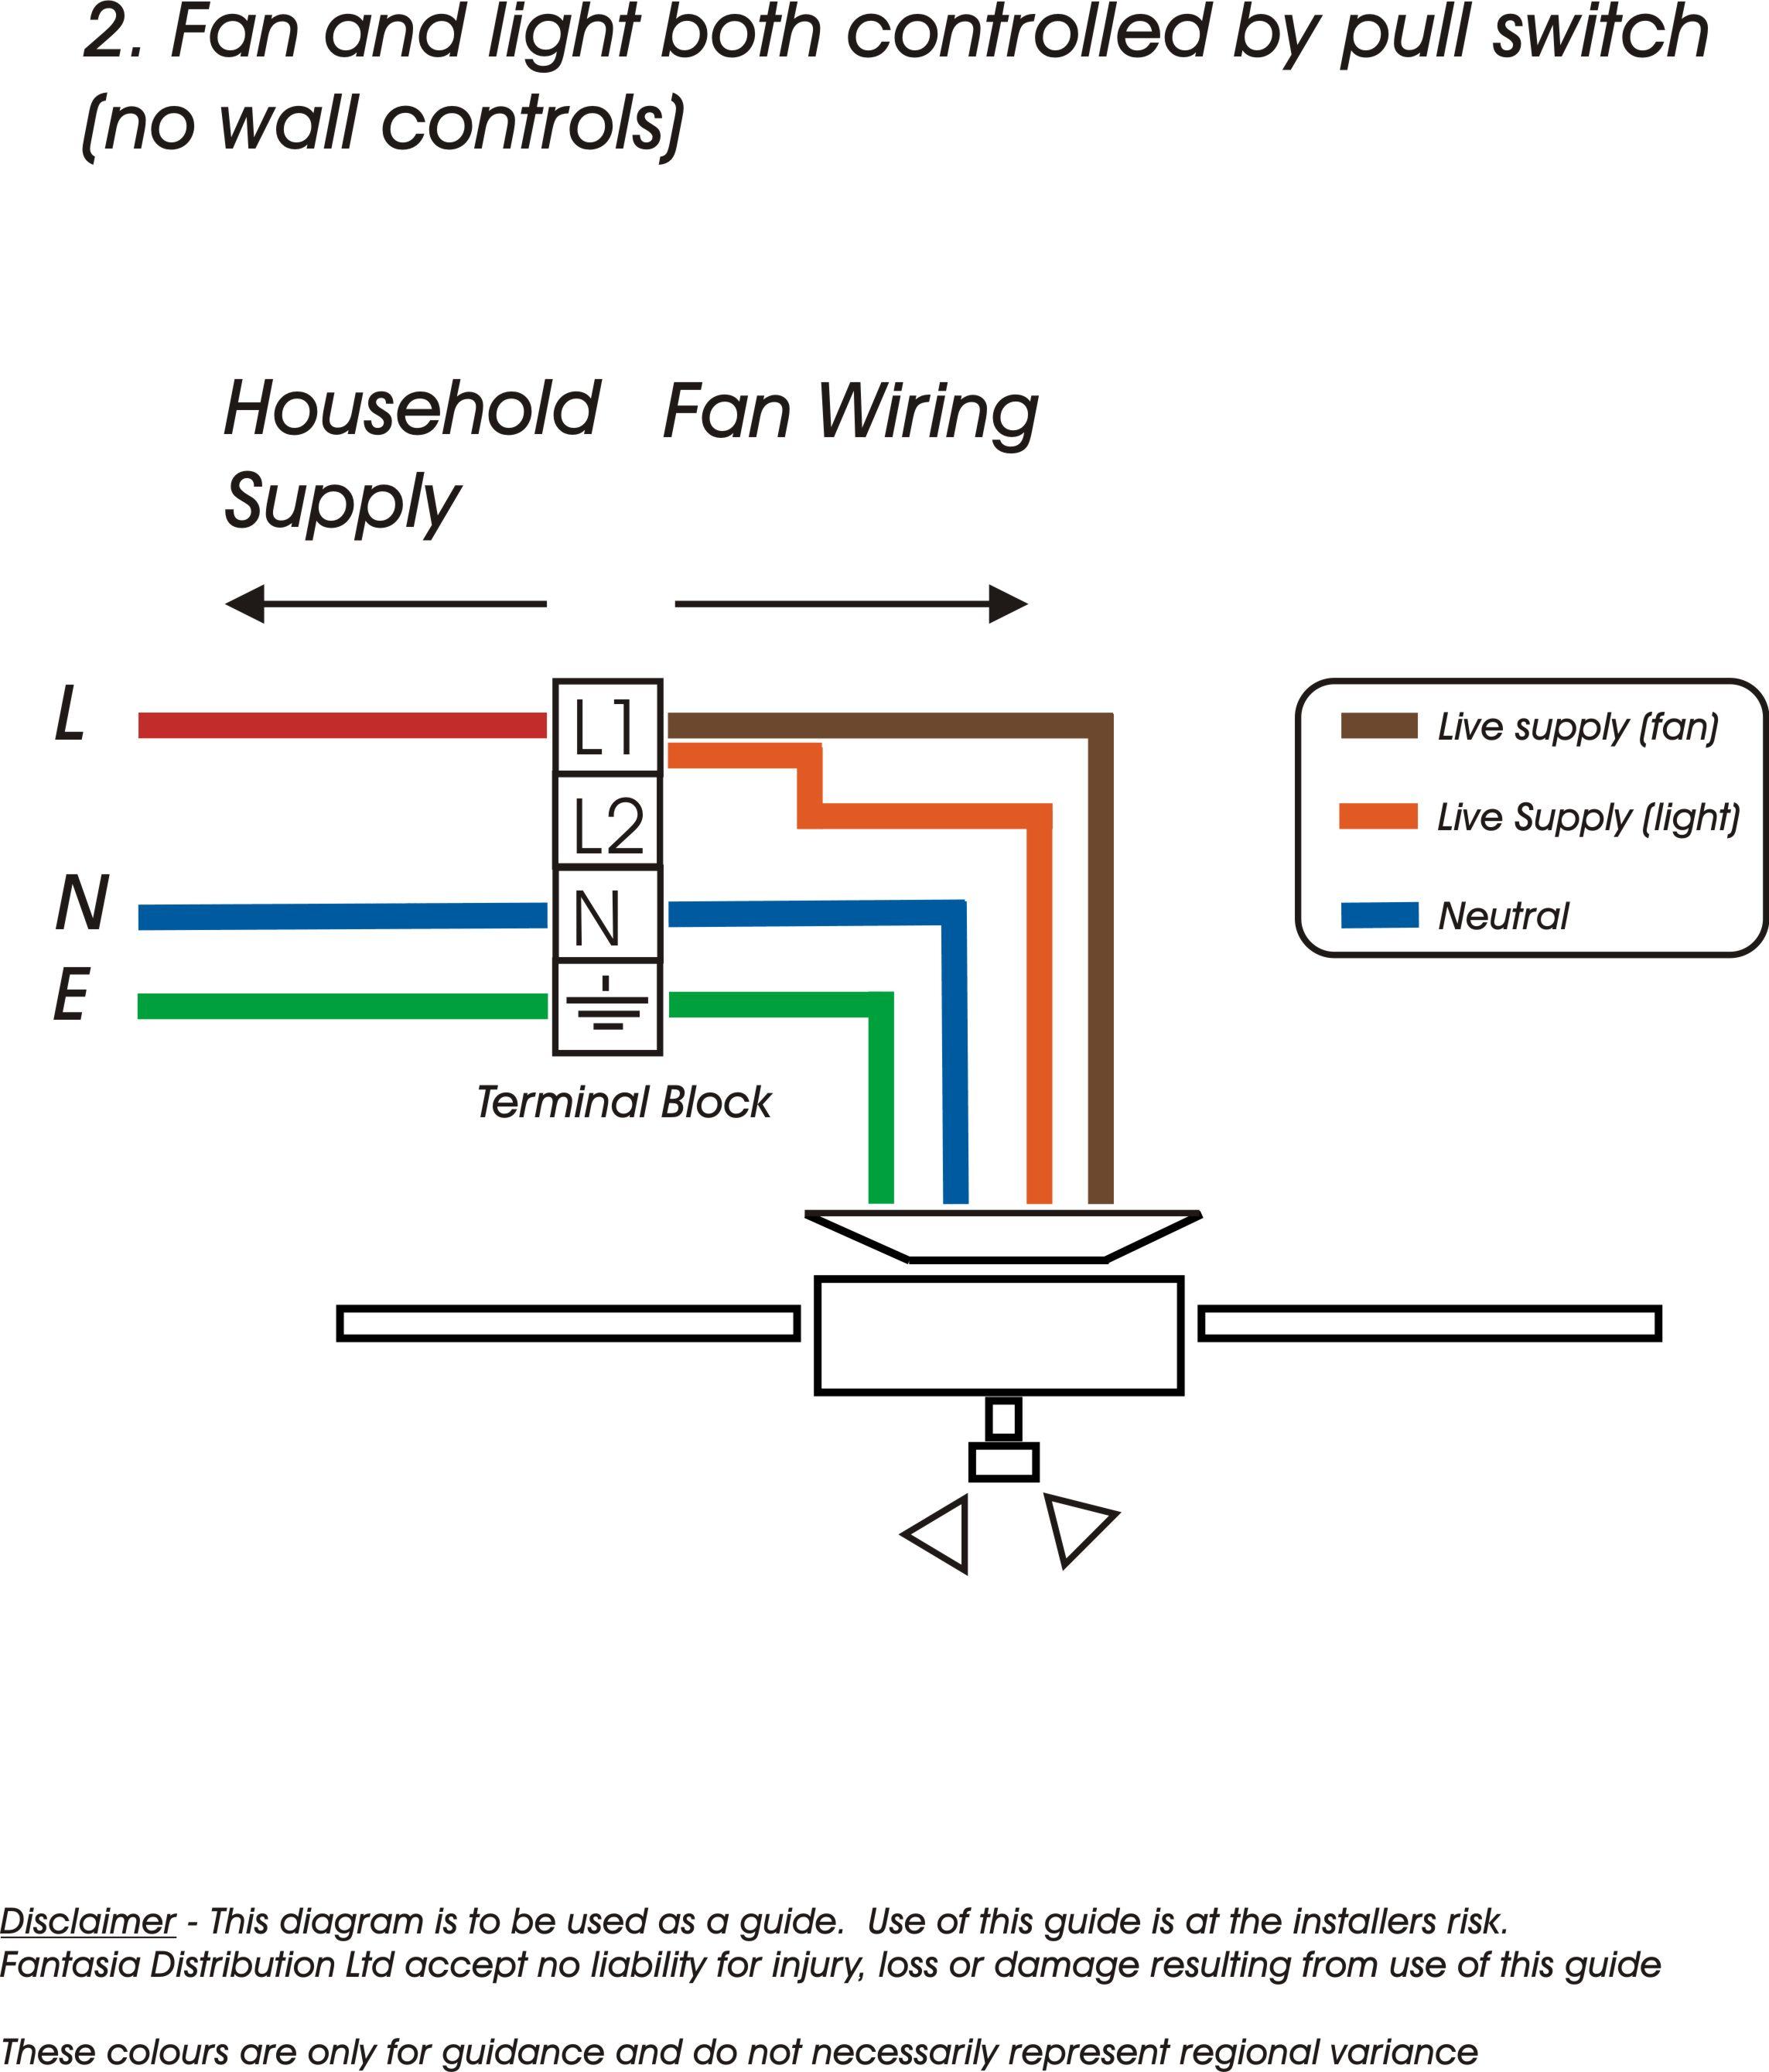 Astonishing Exhaust Fan Wiring Diagram Basic Electronics Wiring Diagram Wiring Cloud Xempagosophoxytasticioscodnessplanboapumohammedshrineorg